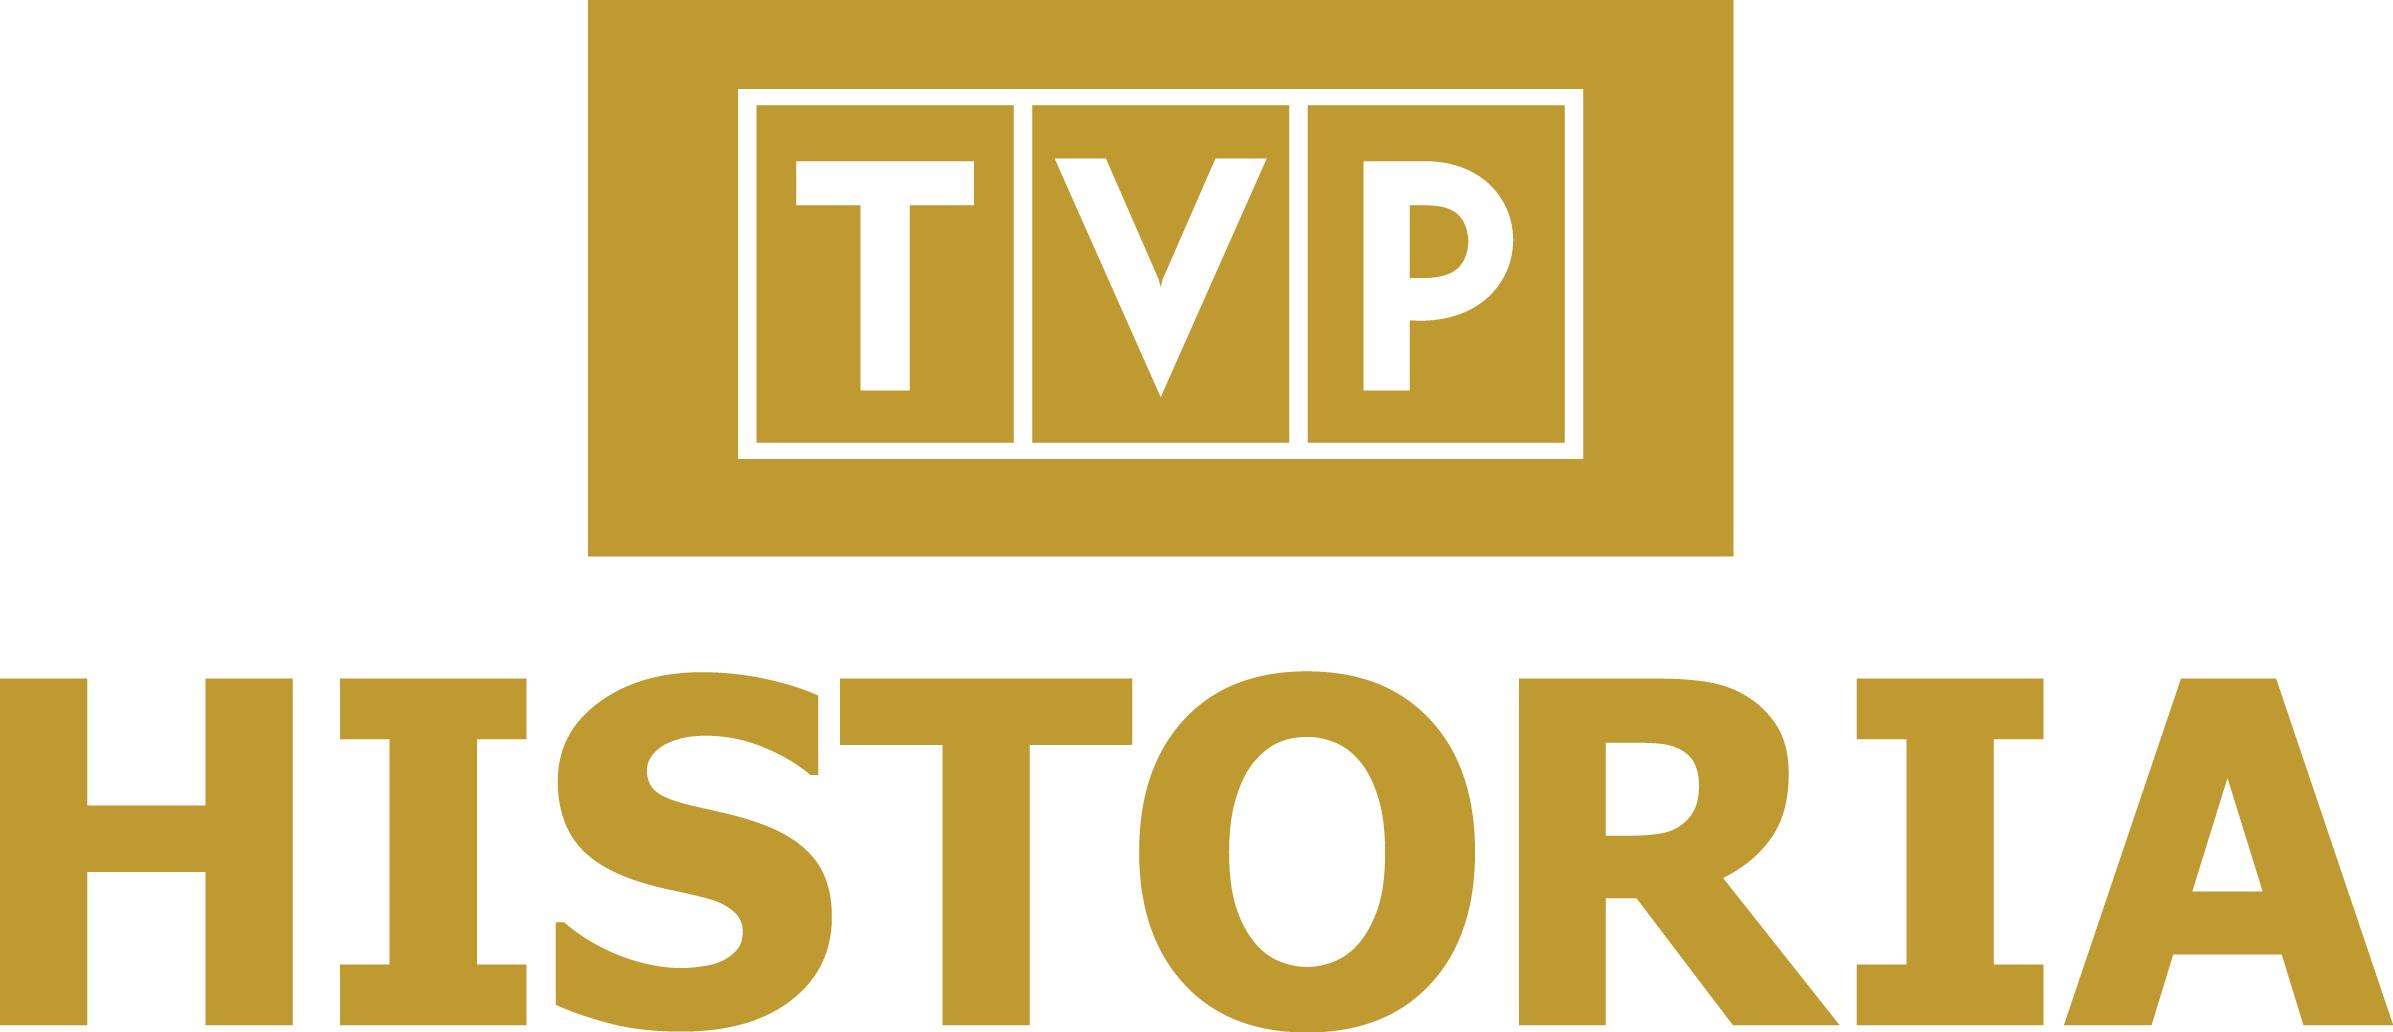 TVP_Historia-logo_nowe.jpg